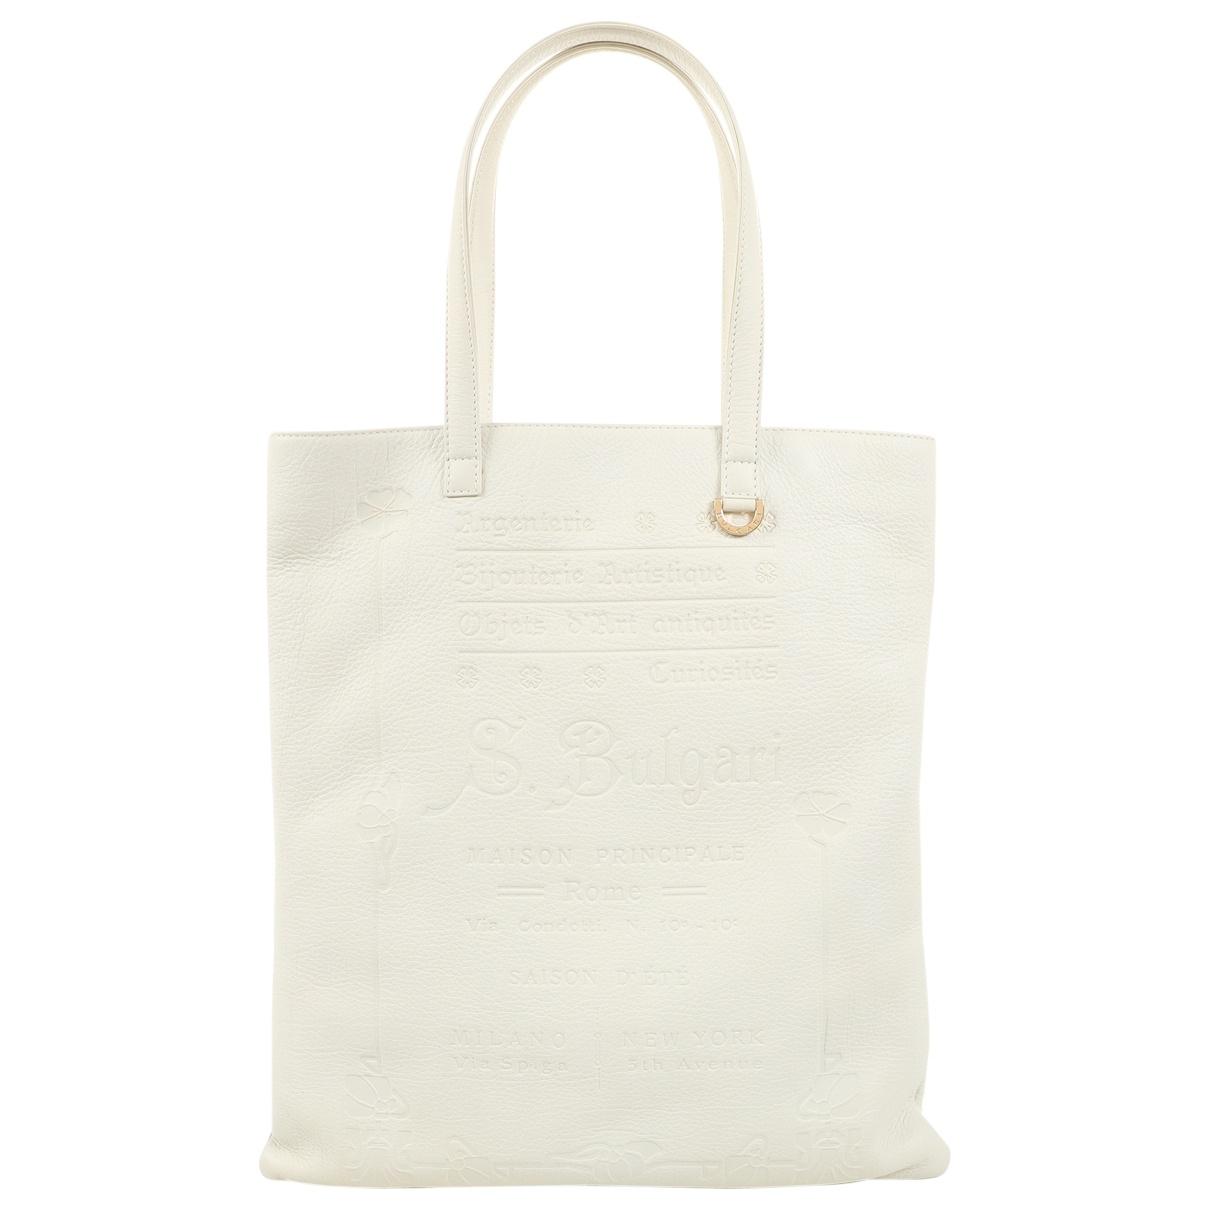 Bvlgari Bulgari White Leather handbag for Women \N